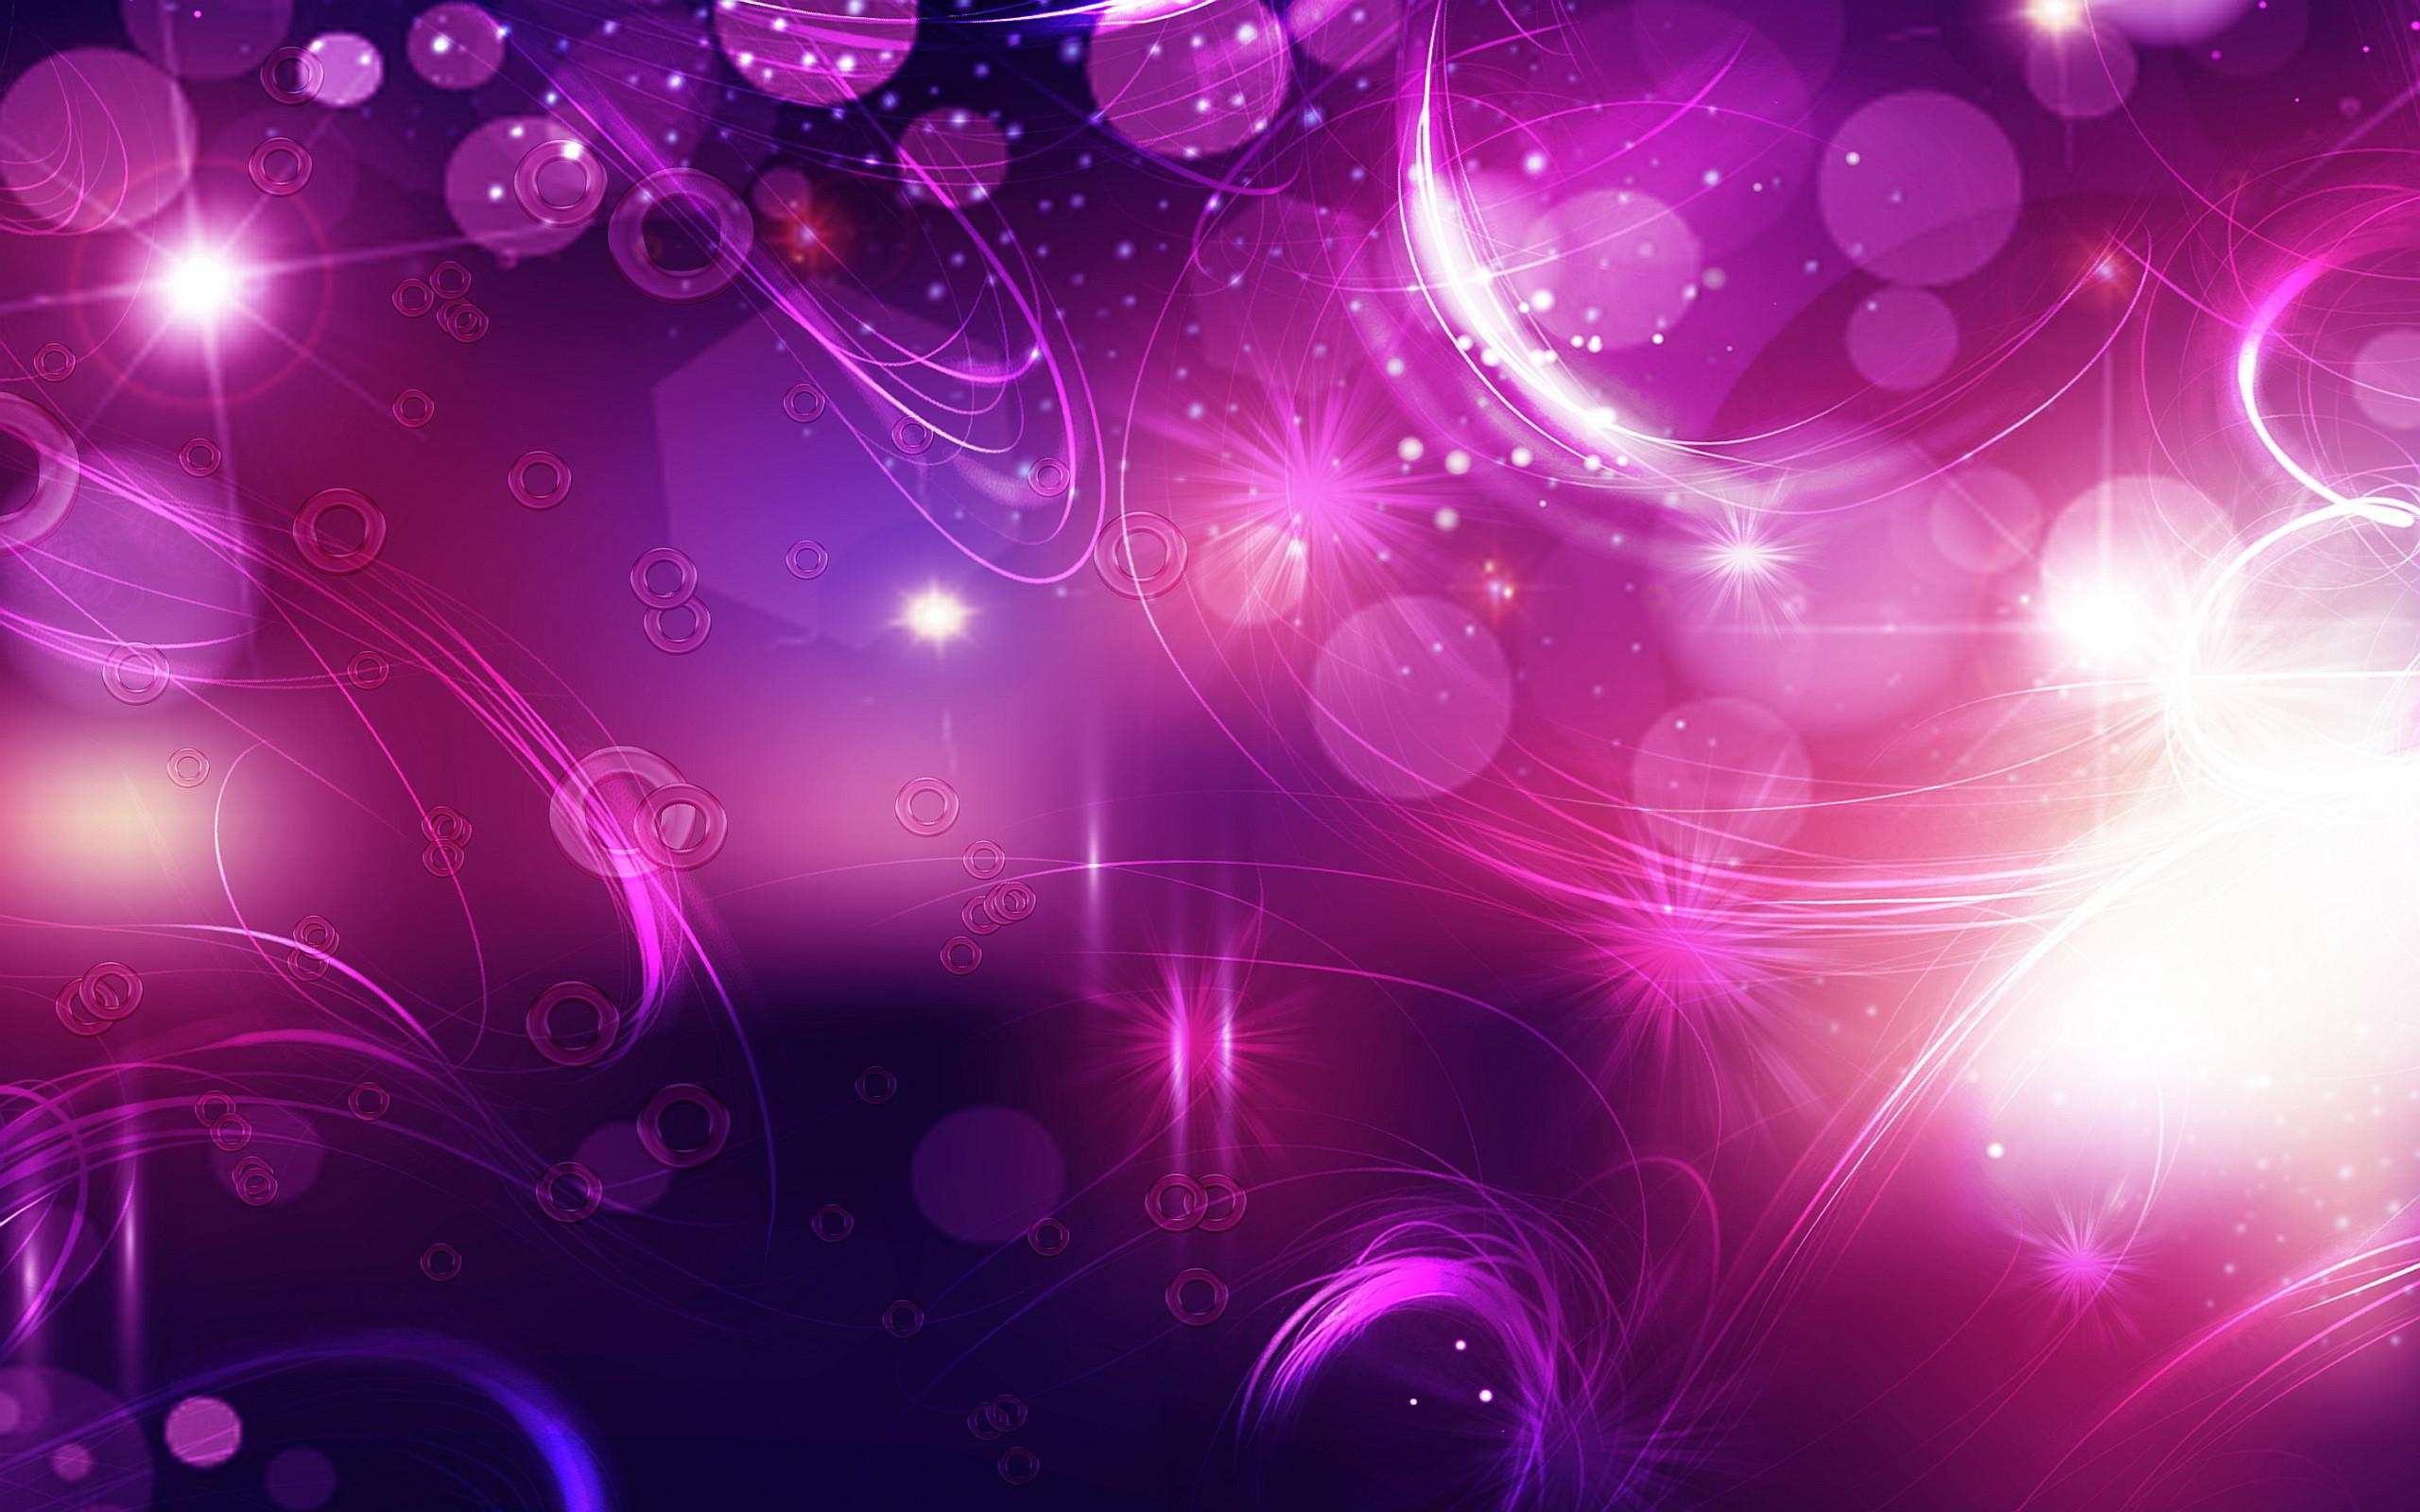 Purple Wallpaper 3ED.